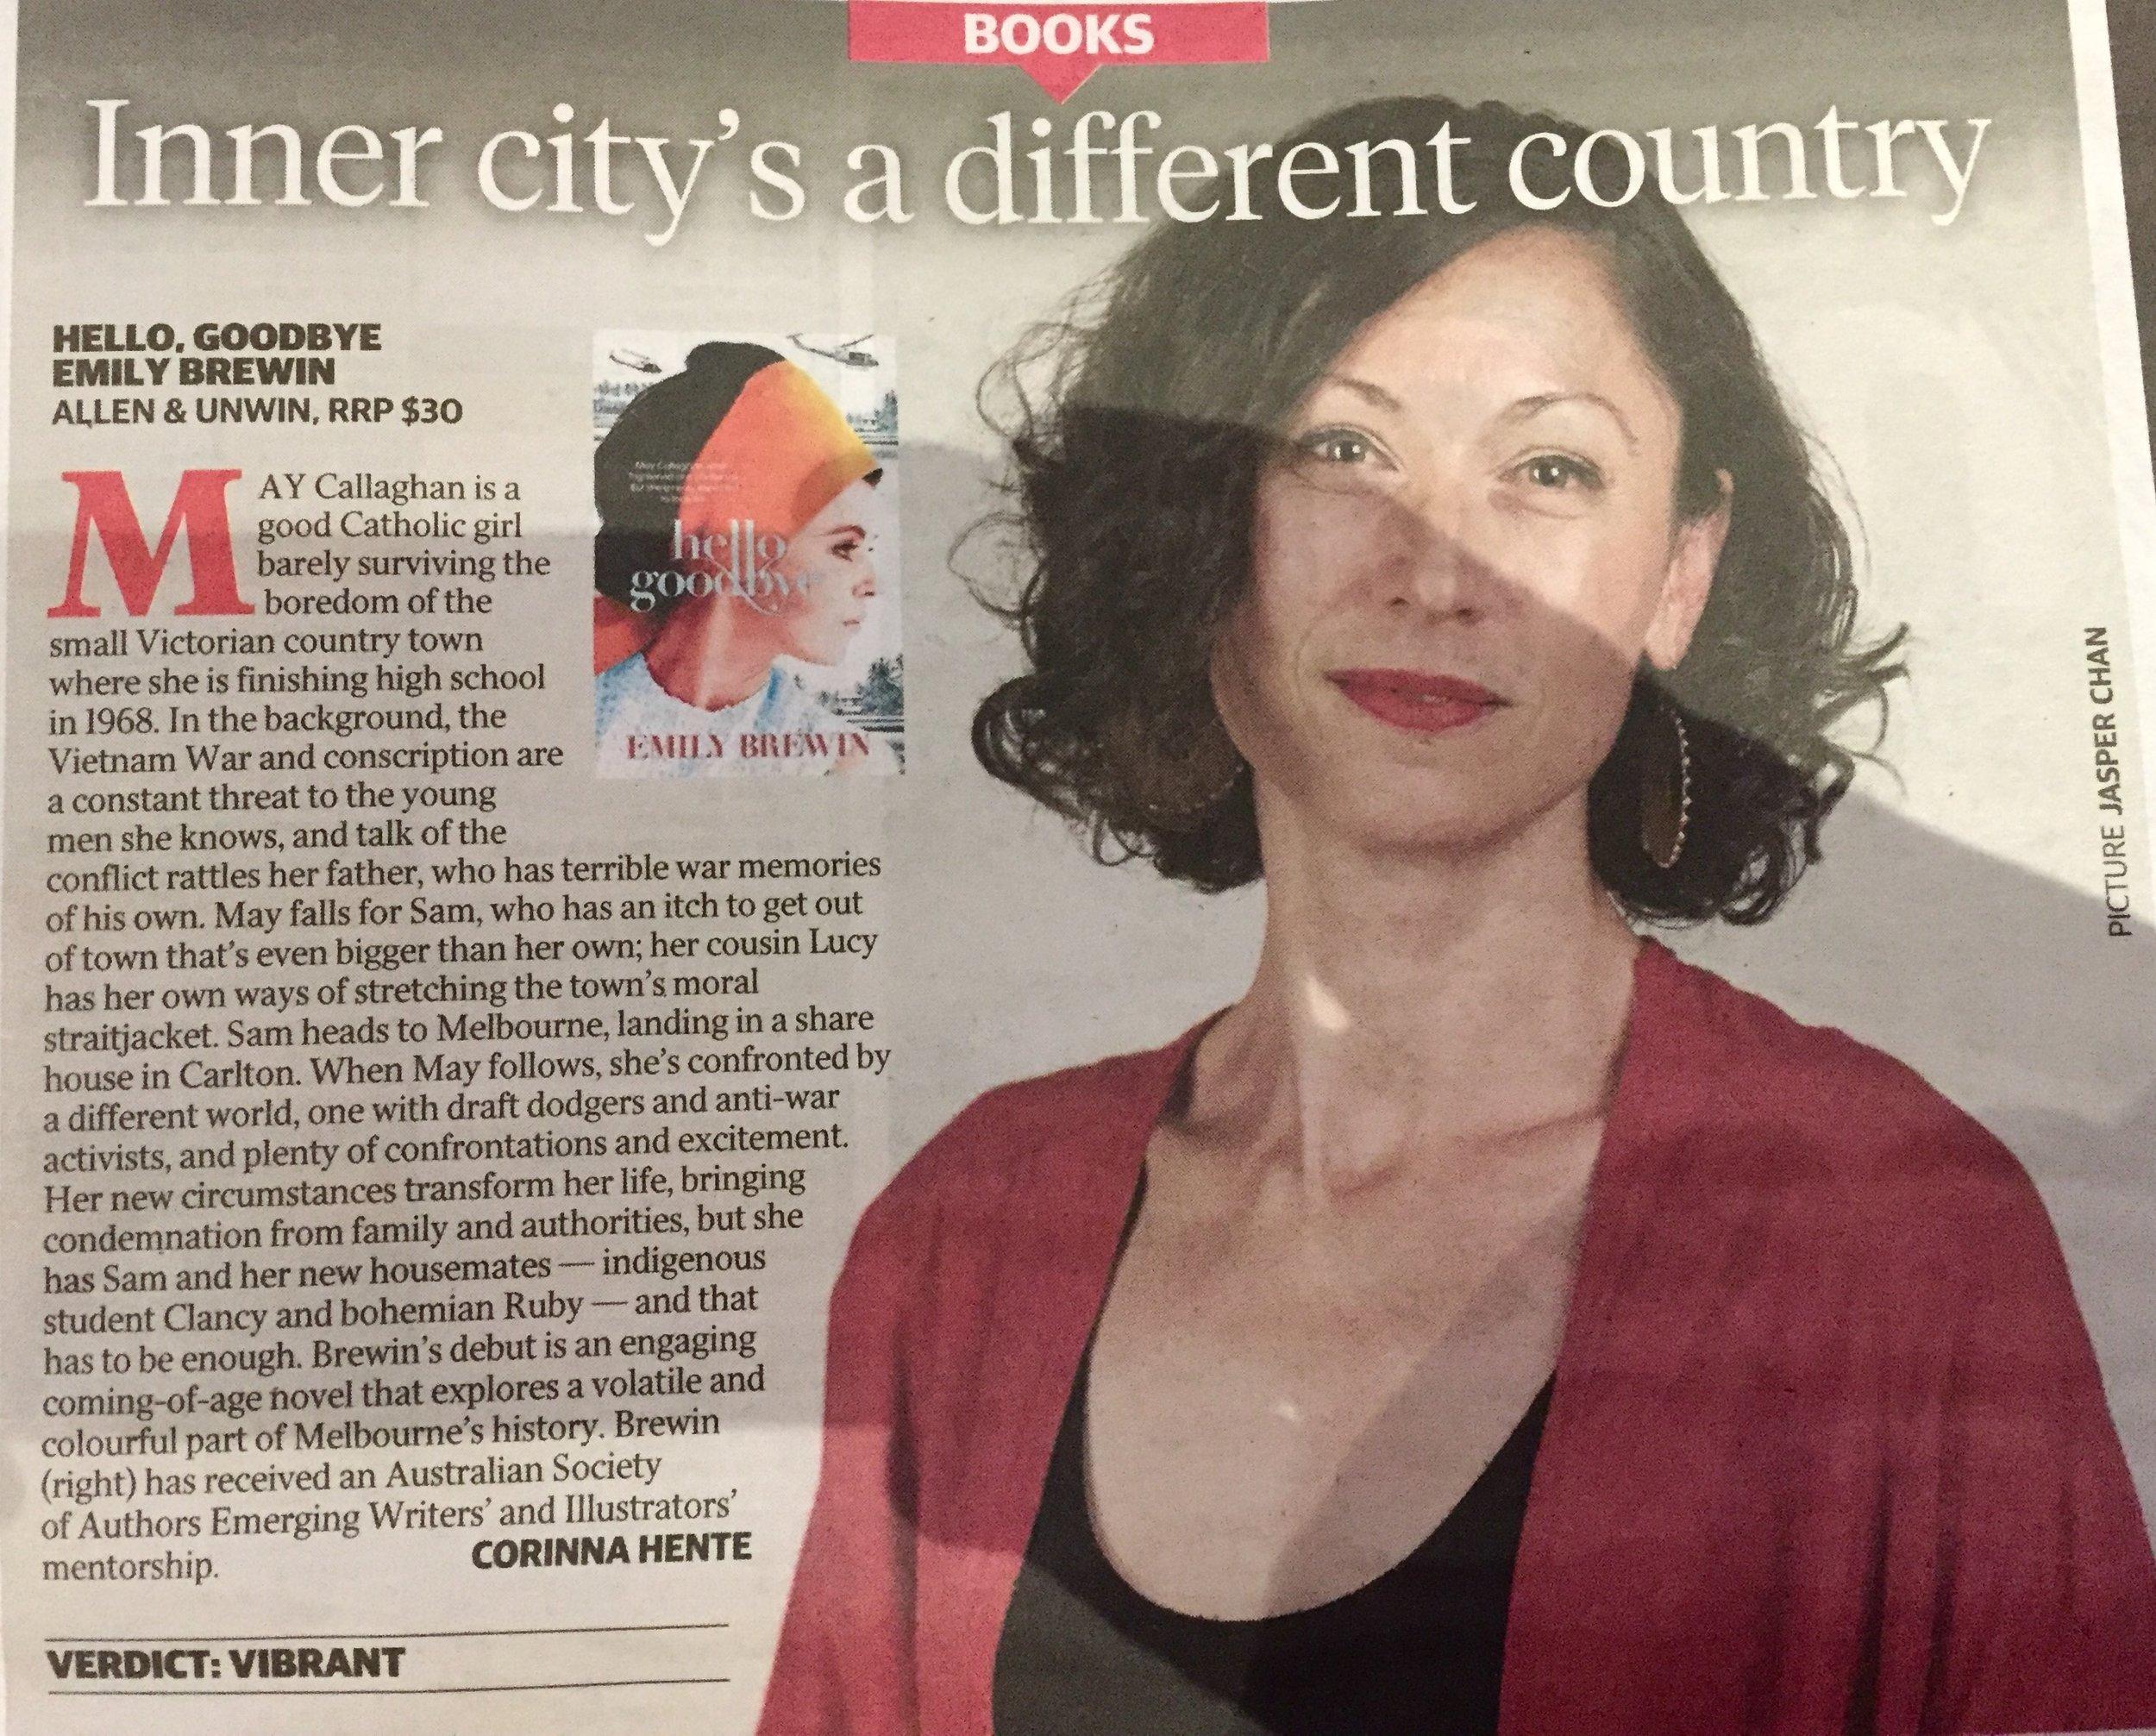 The Herald Sun: 8th July 2017